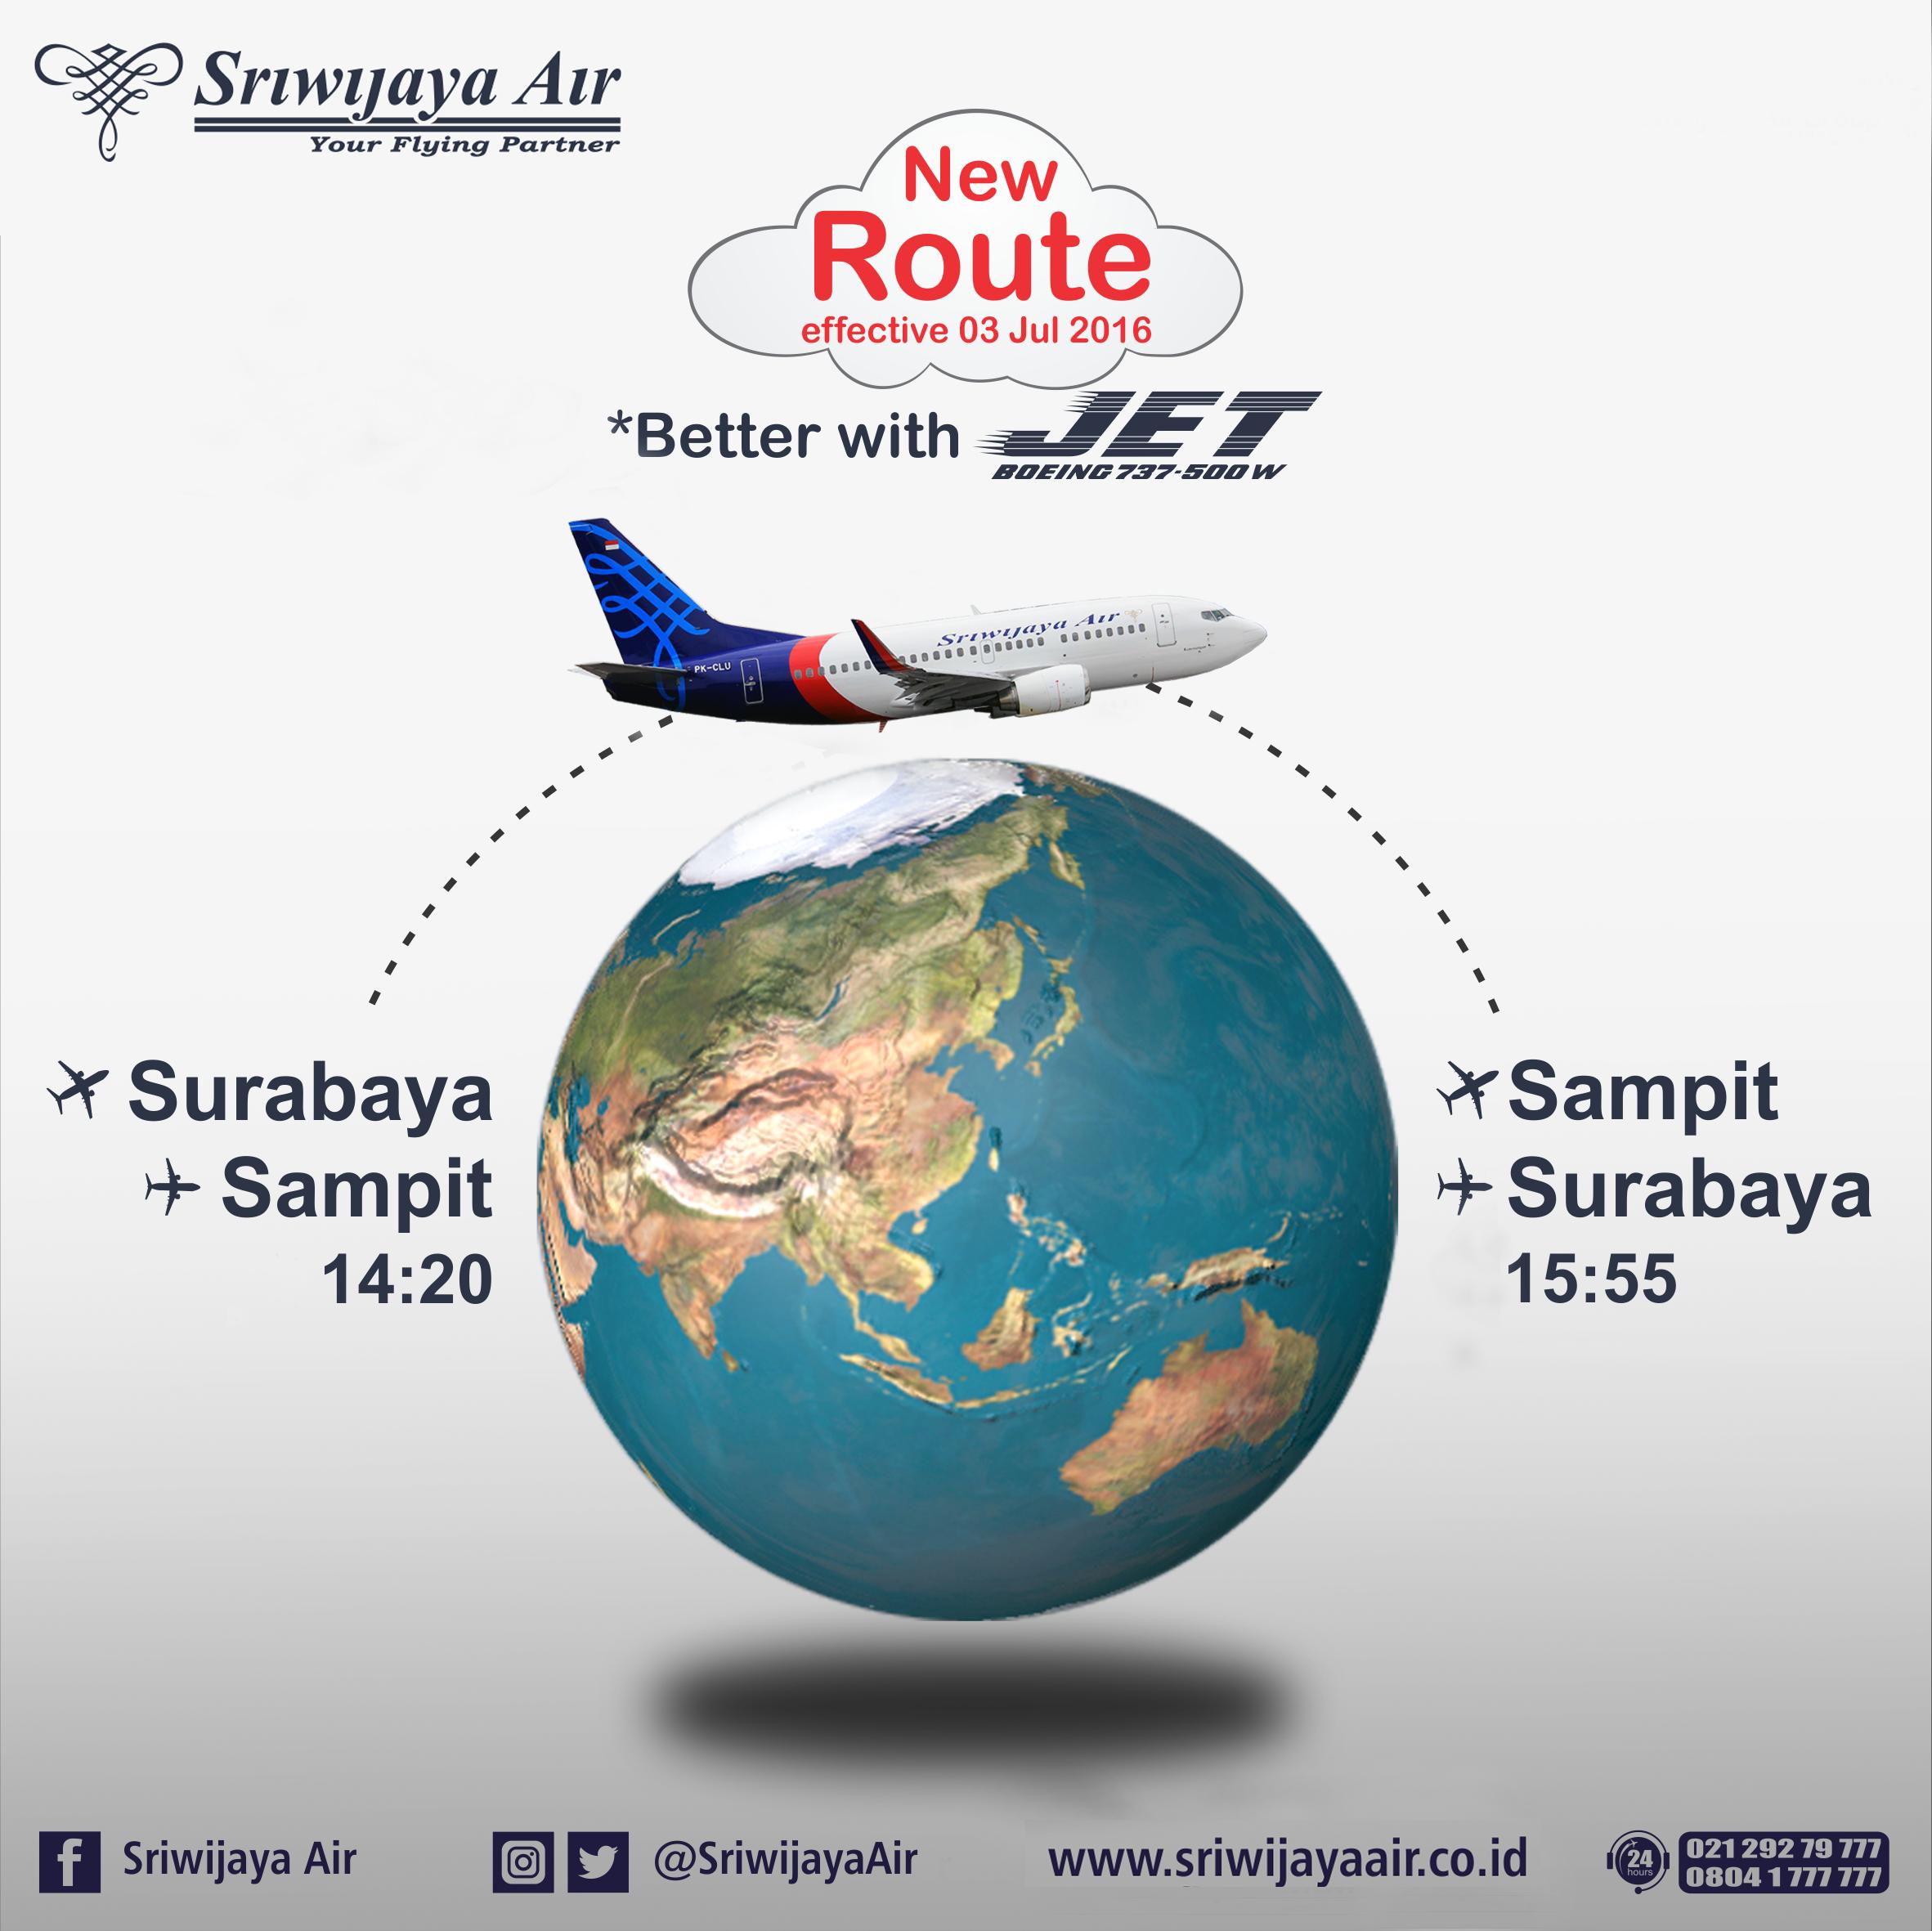 Rute Baru Surabaya Sampit Pp Book Now Sriwijayaair Co Id Bit Ly Sriwijayamobile 021 29279777 0804 1 777 777 Kantor Penjualan Sri Surabaya Indonesia